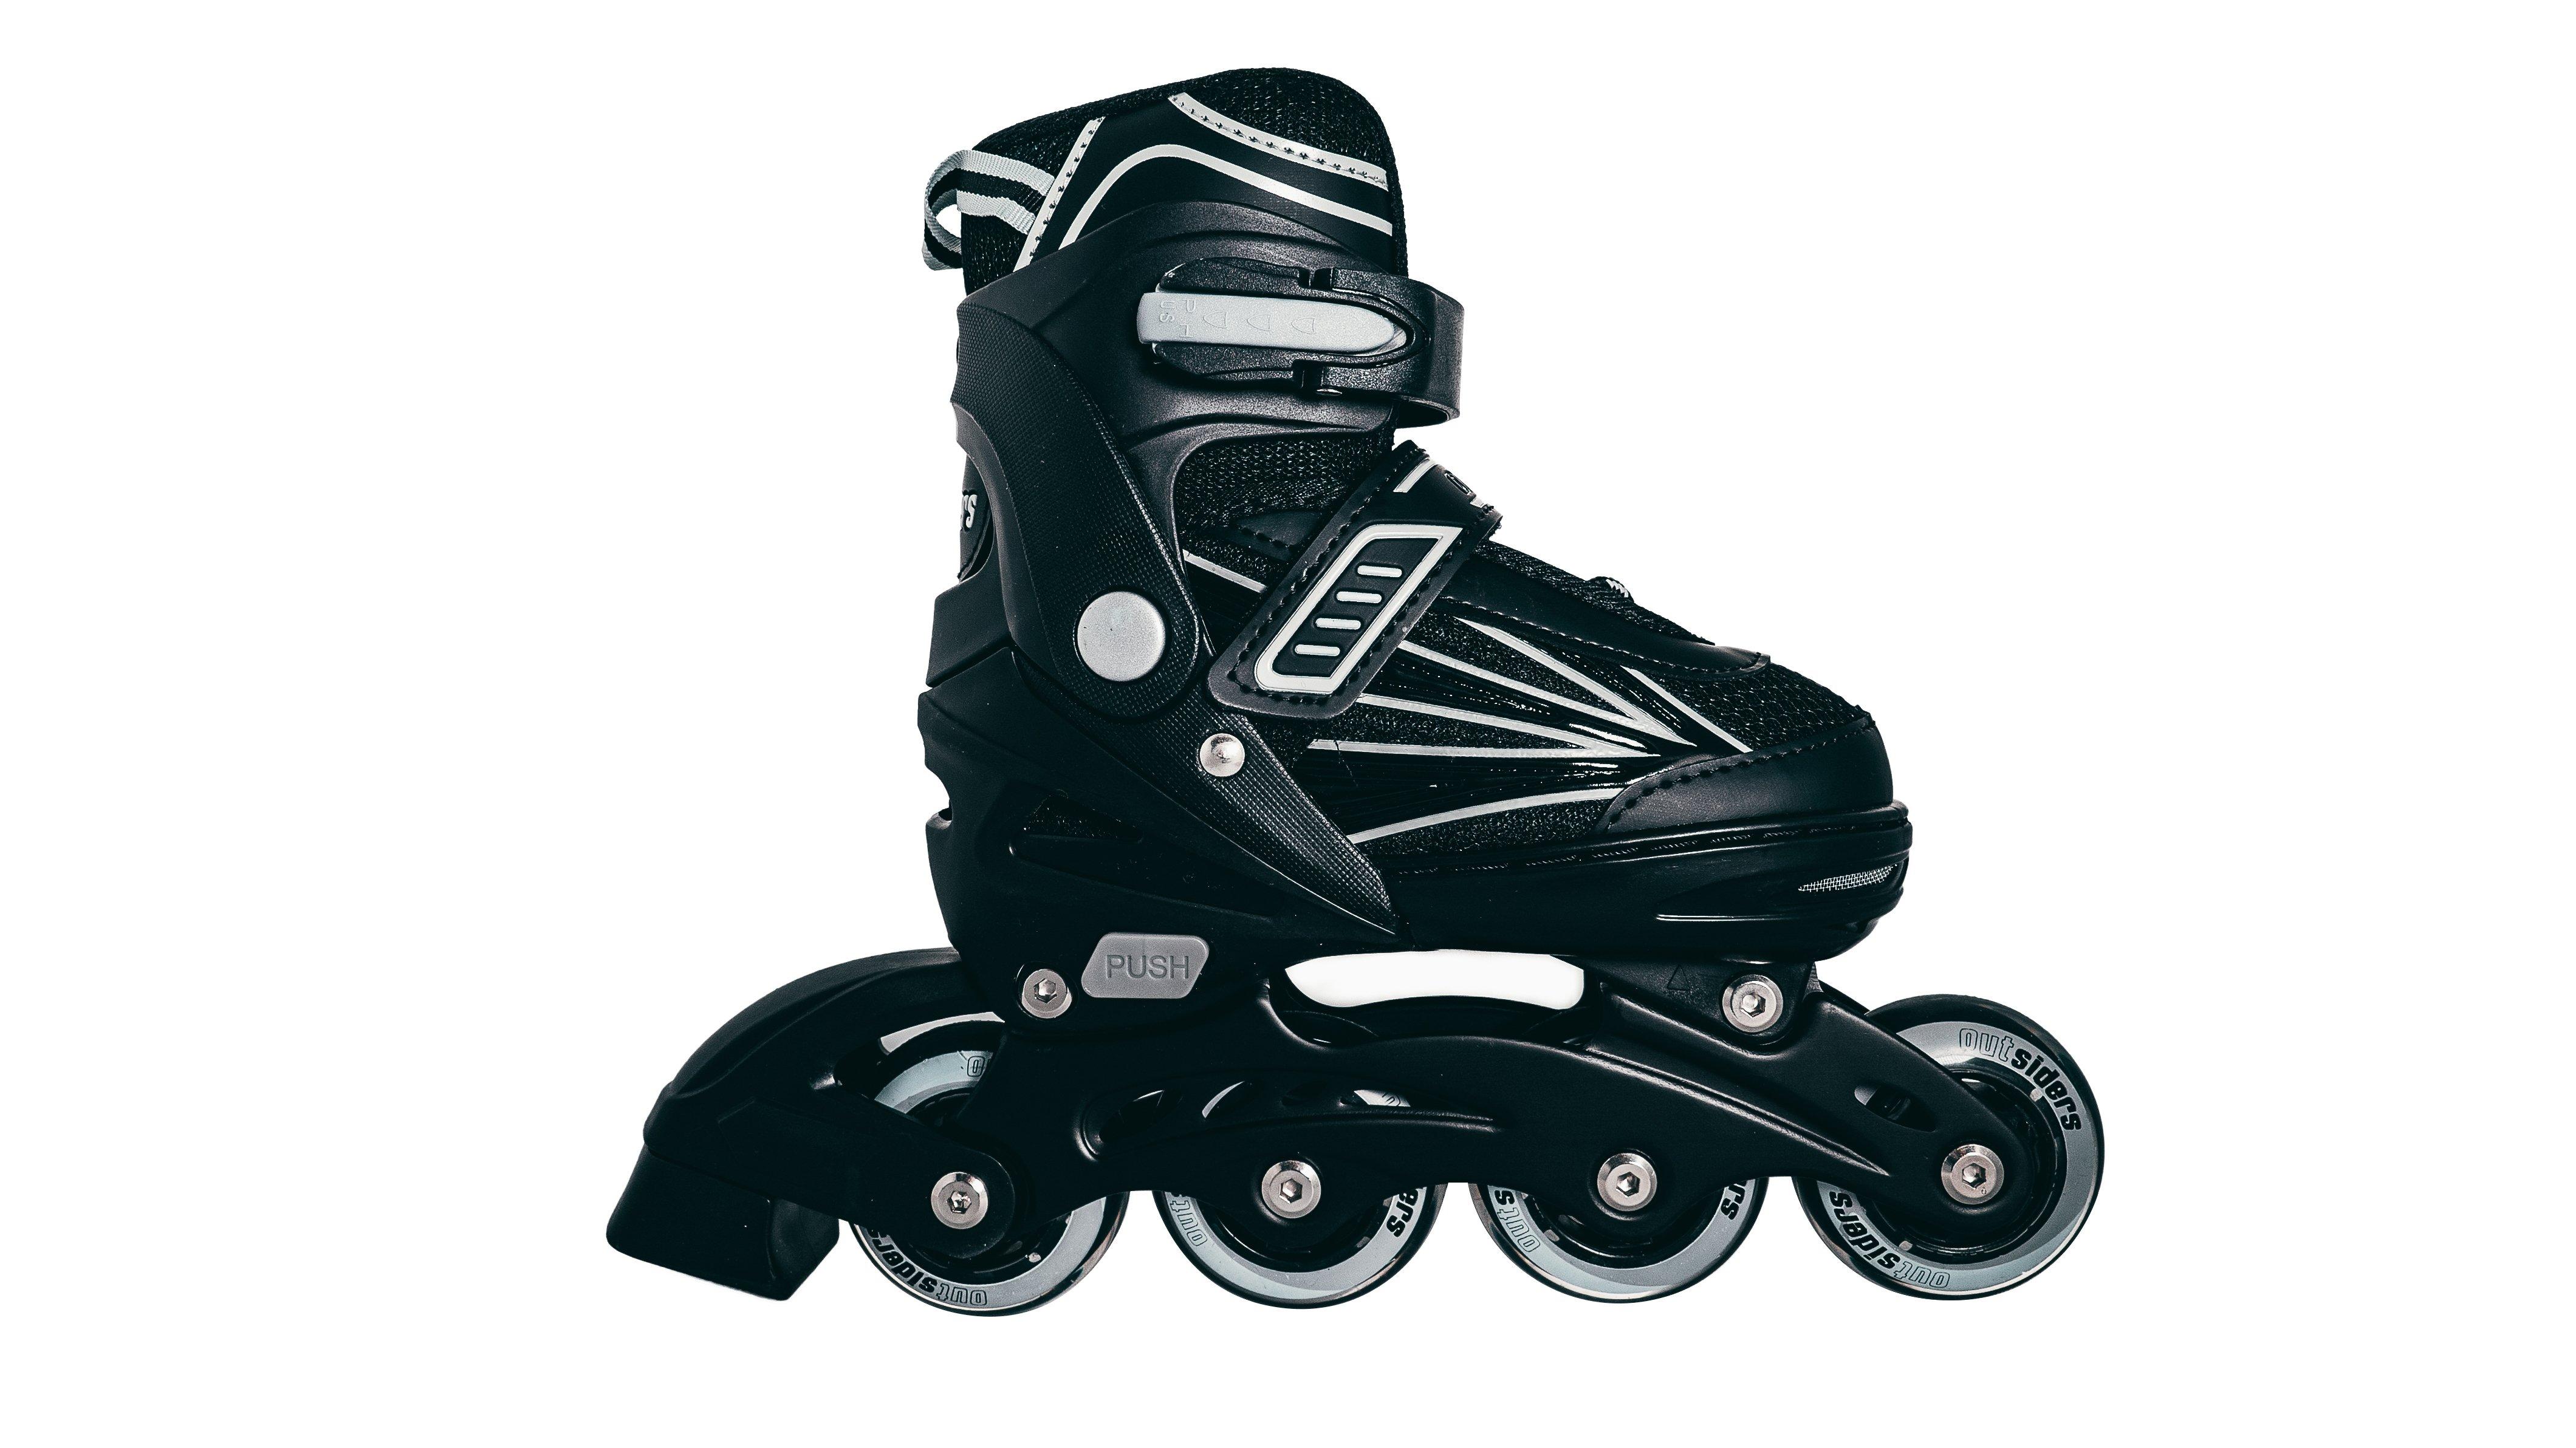 Outsiders - Adjustable Kids Inline Rollerblades - Black/Grey (size: 35-38)